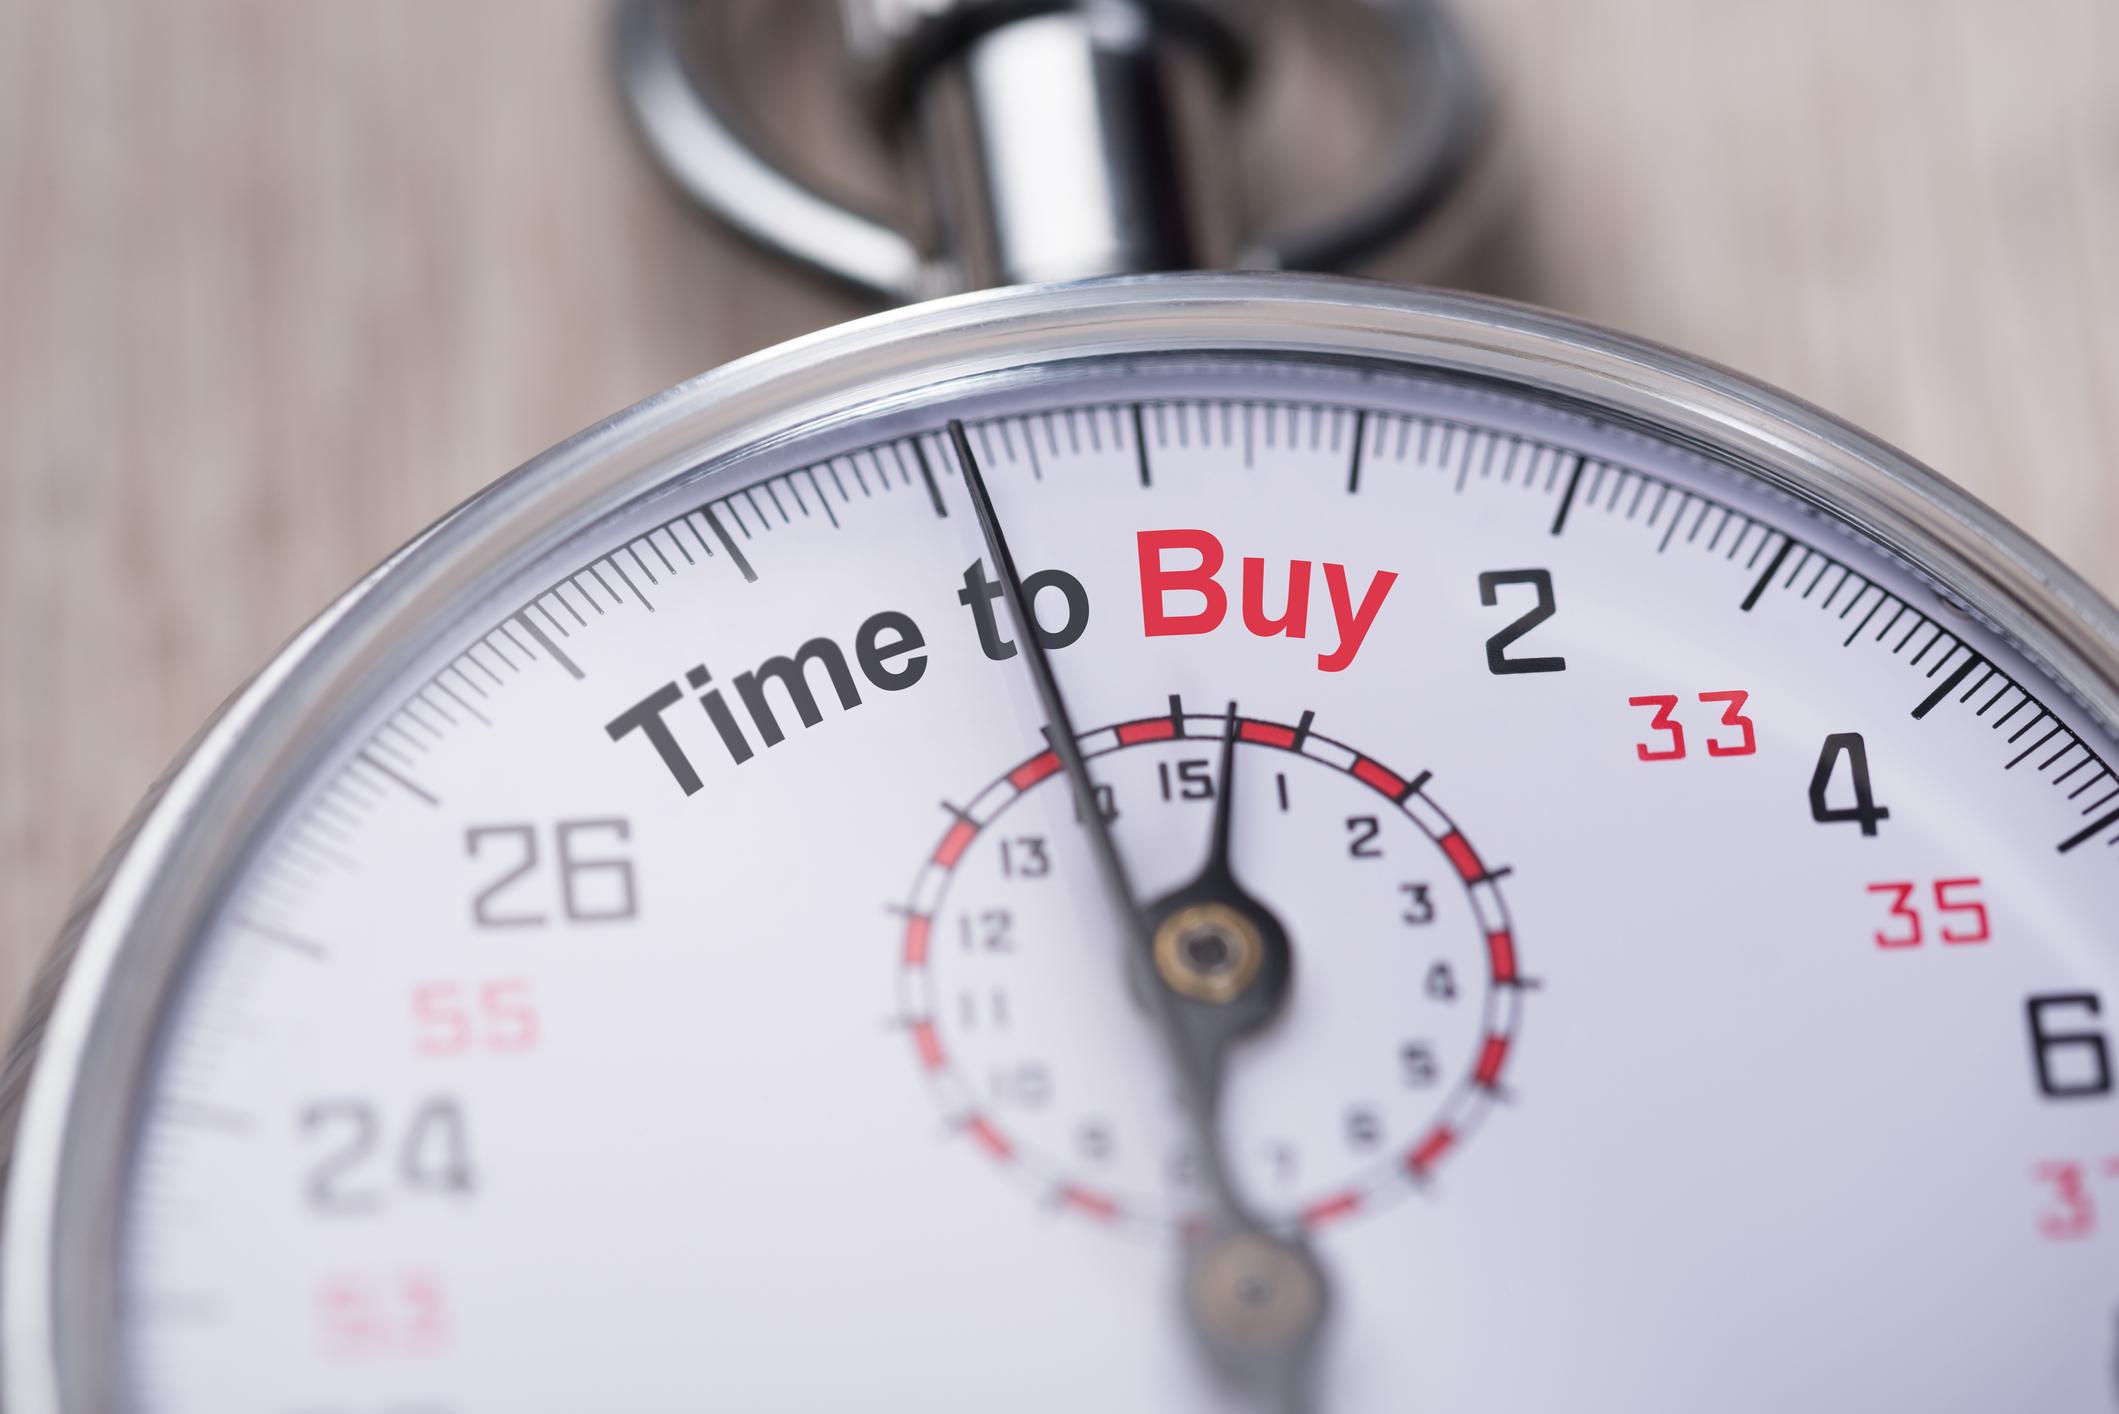 3 Stocks Robinhood Investors Should Buy Hand Over Fist